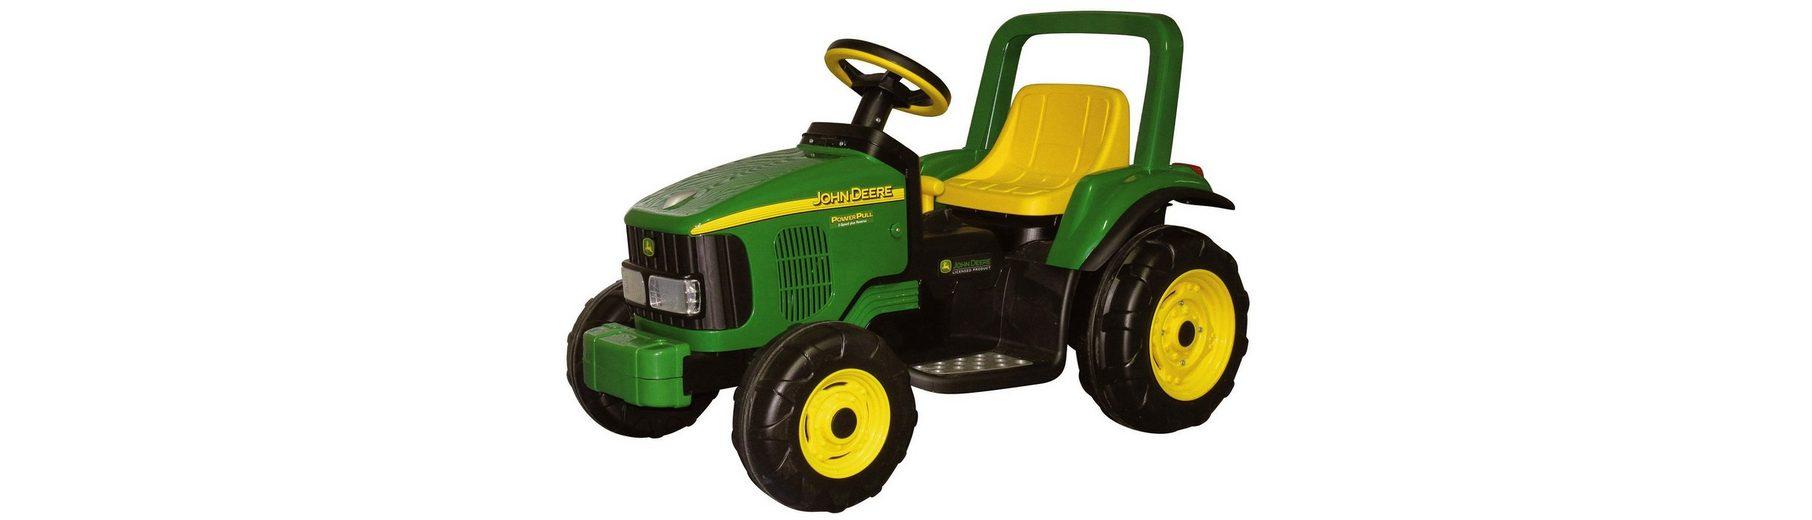 Peg-Pérego Elektrofahrzeug für Kinder Traktor »Power Pull, John Deere - 6V«